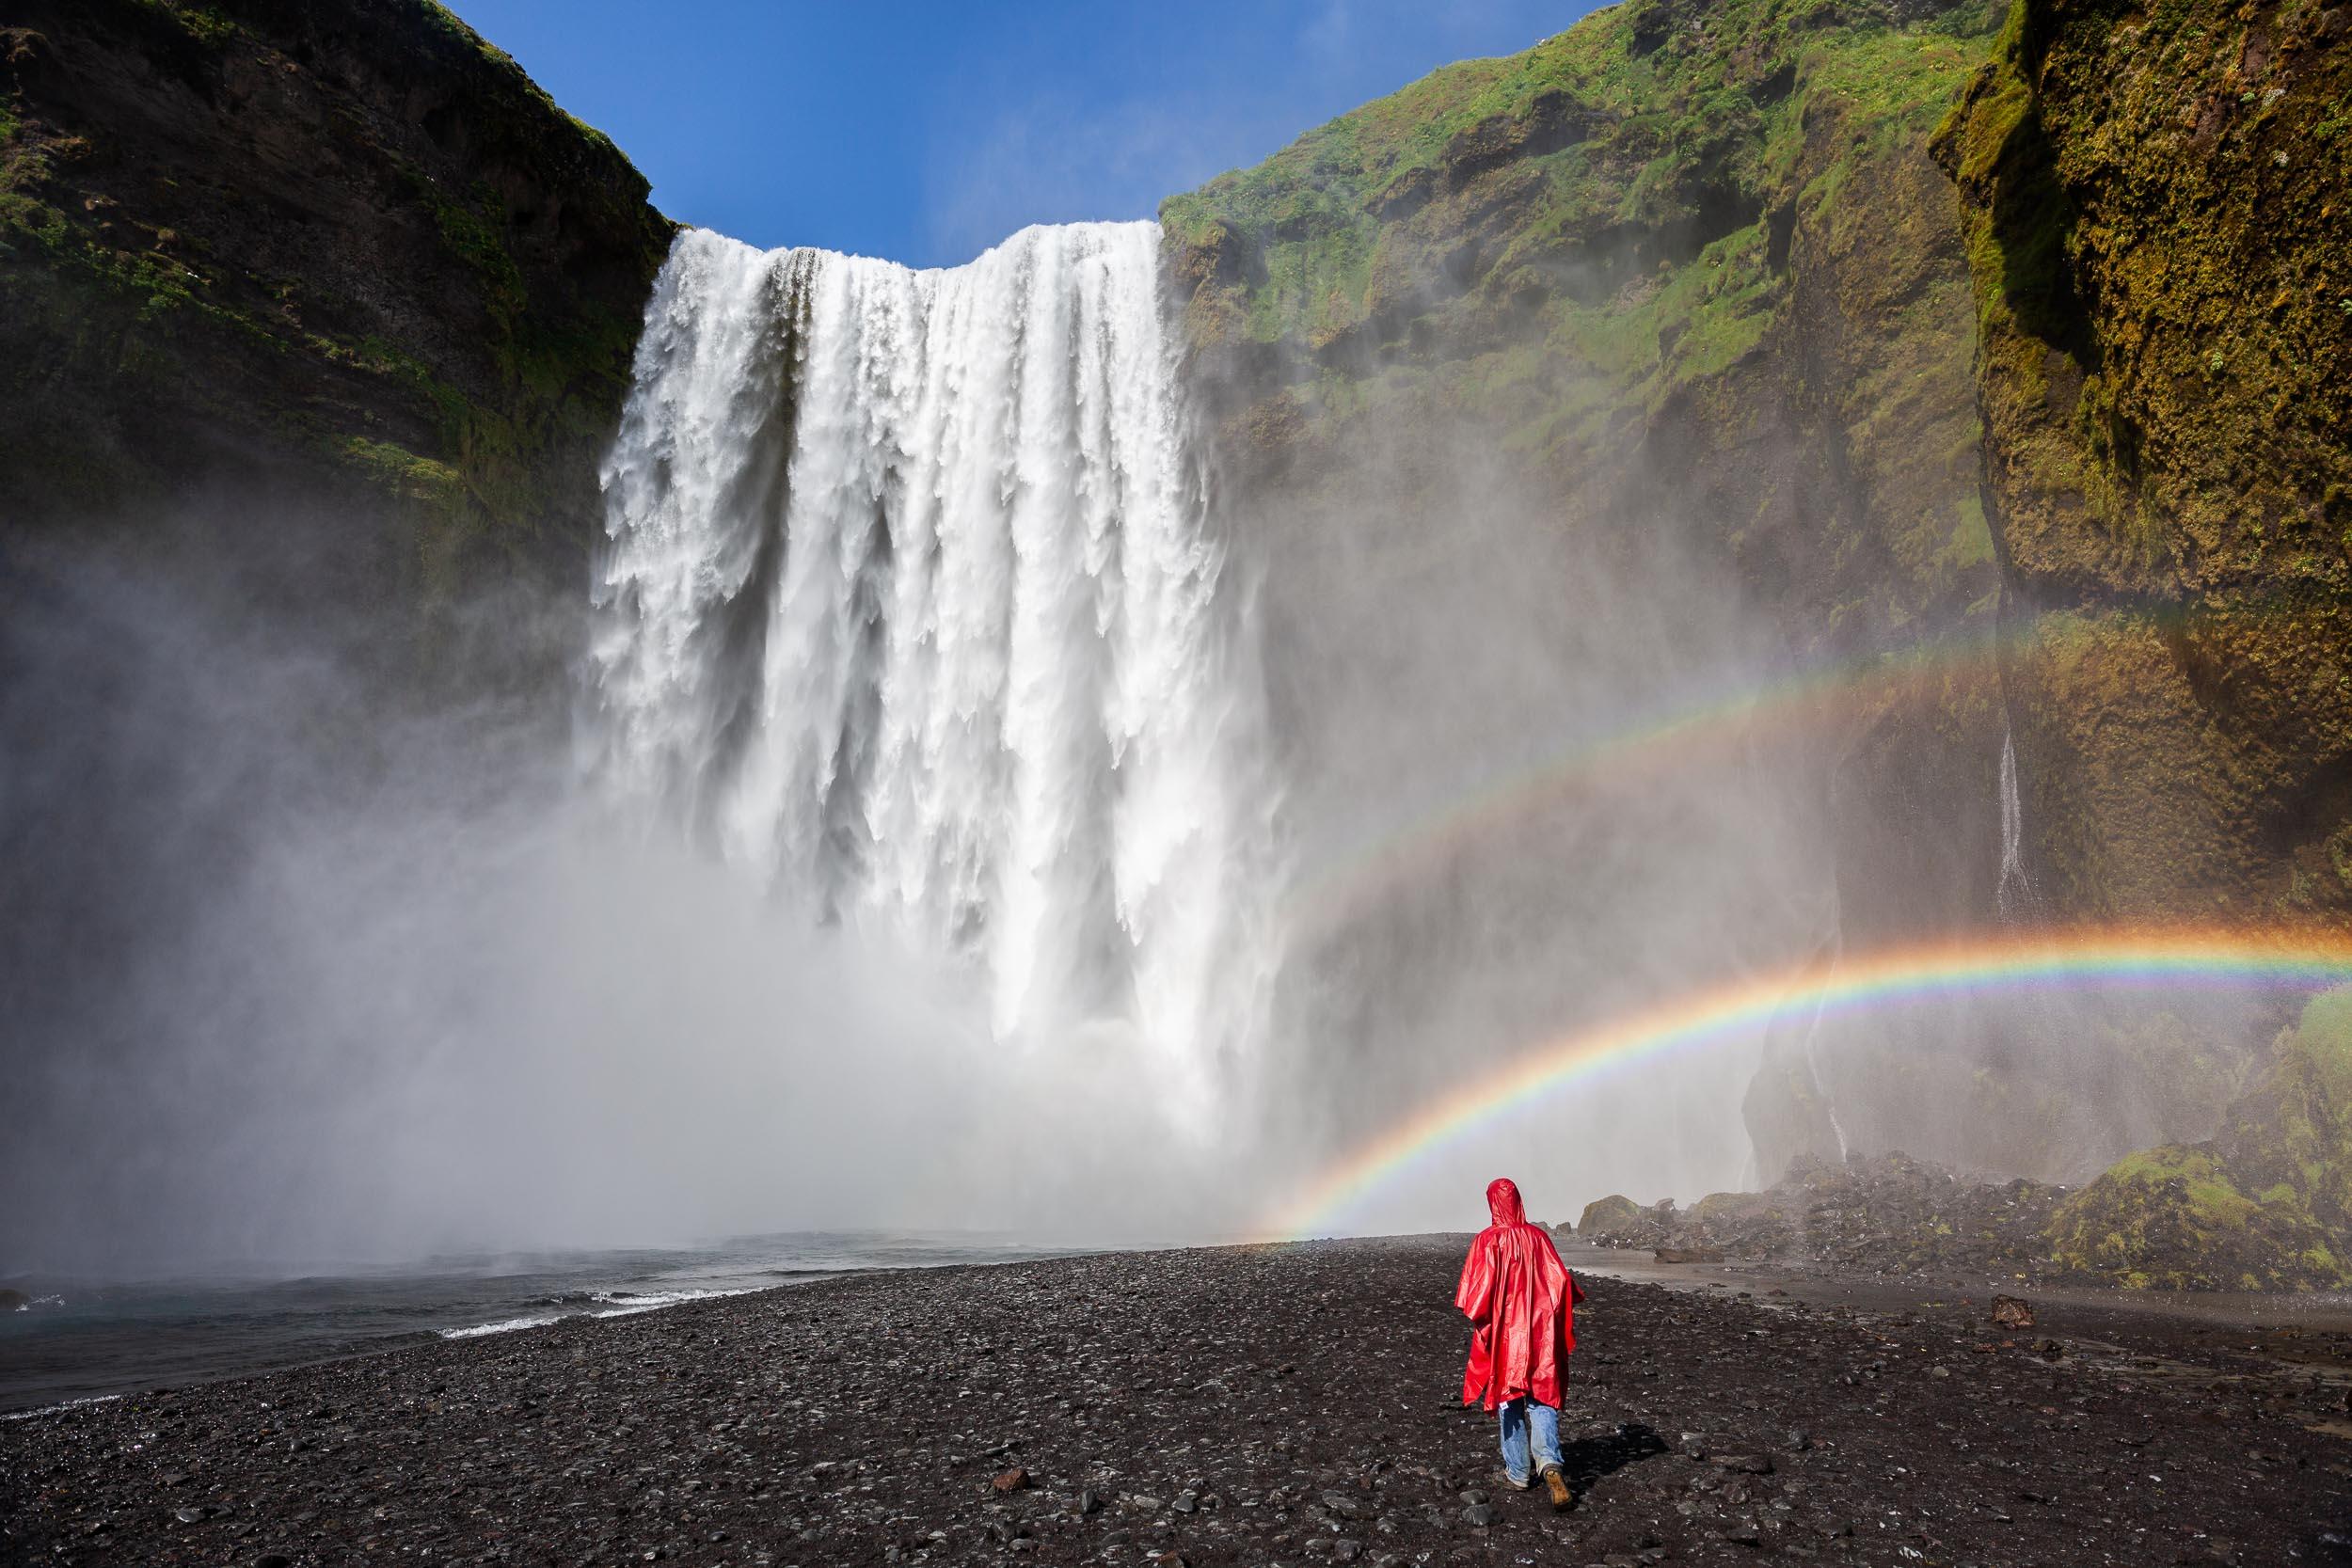 Skogarfoss waterfall with red raincoat under a rainbow